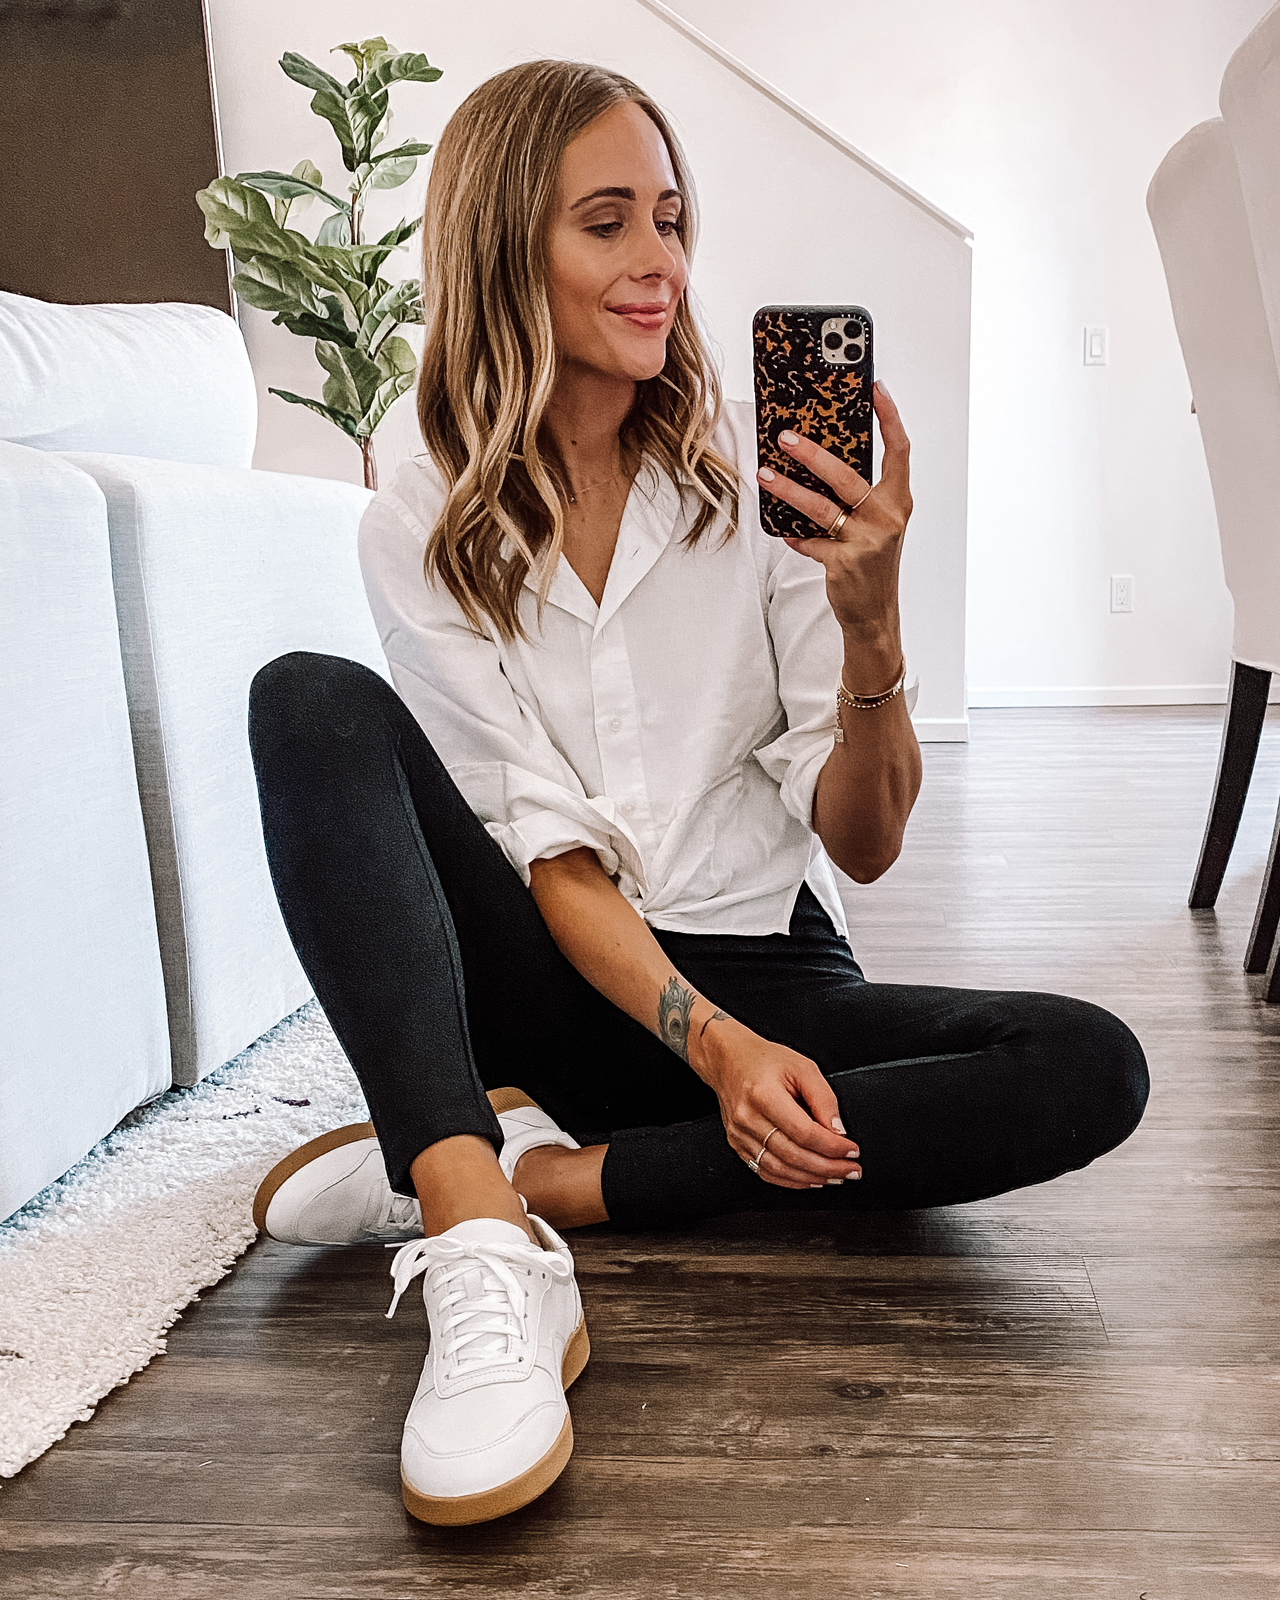 Fashion Jackson Wearing Linen White Button Front Shirt Black Leggings White Sneakers